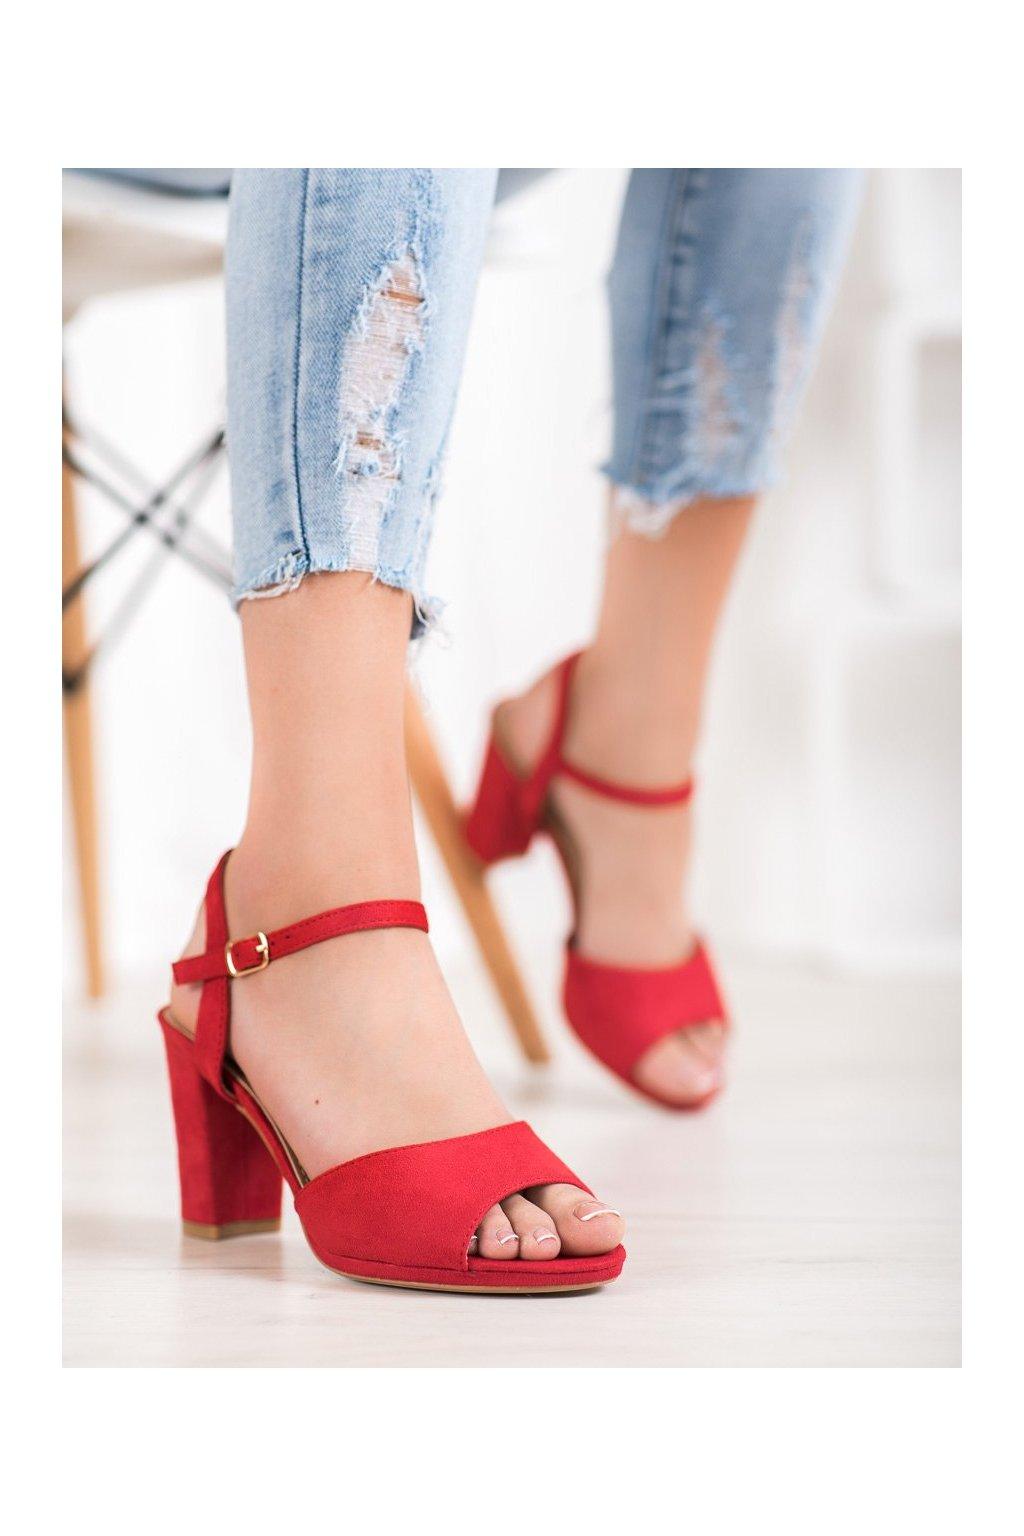 Červené sandále Shelovet kod 955-47R